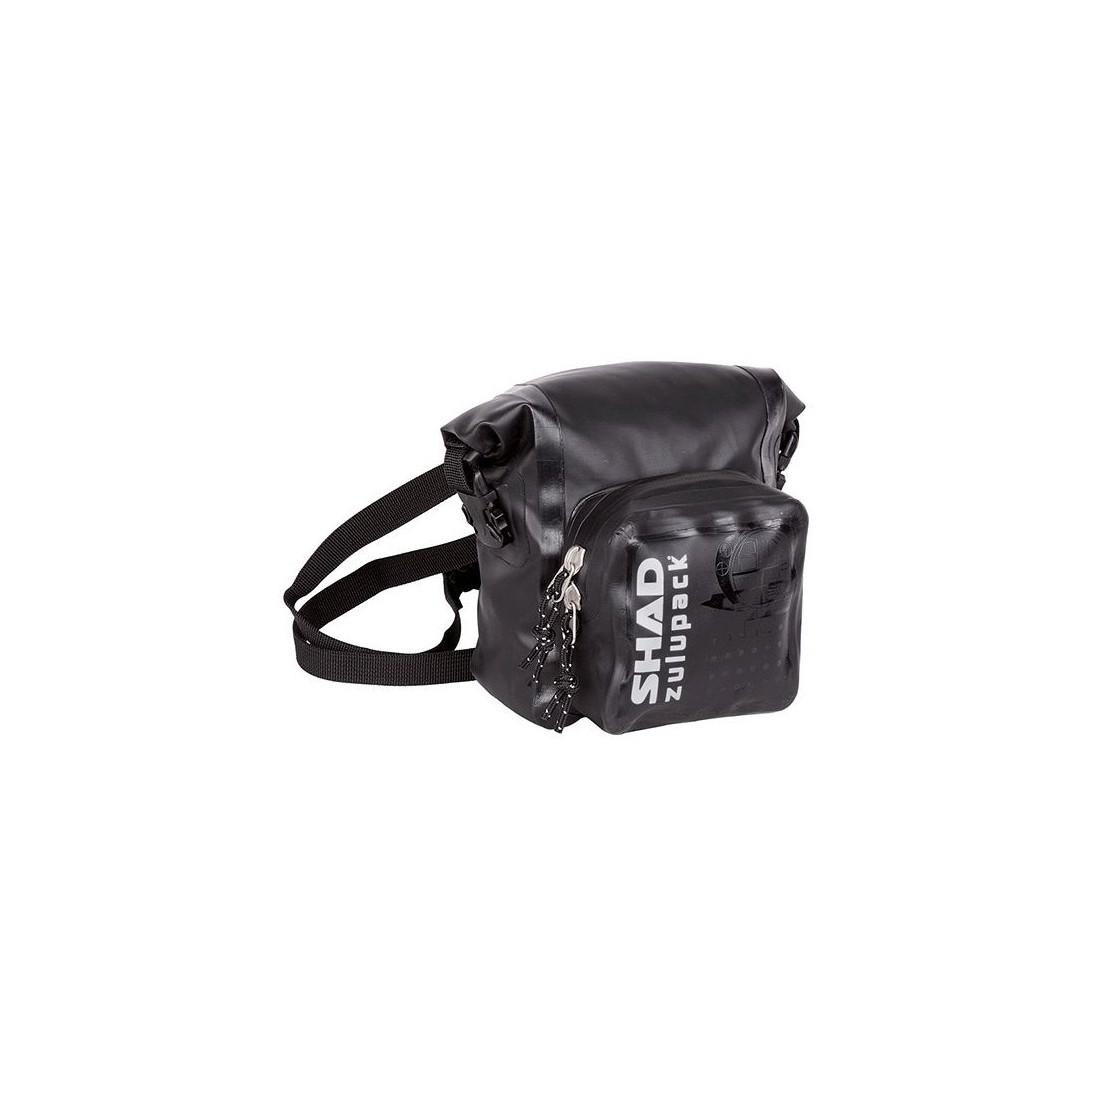 Bolsa Pequeña Impermeable Shad SW05 Negro